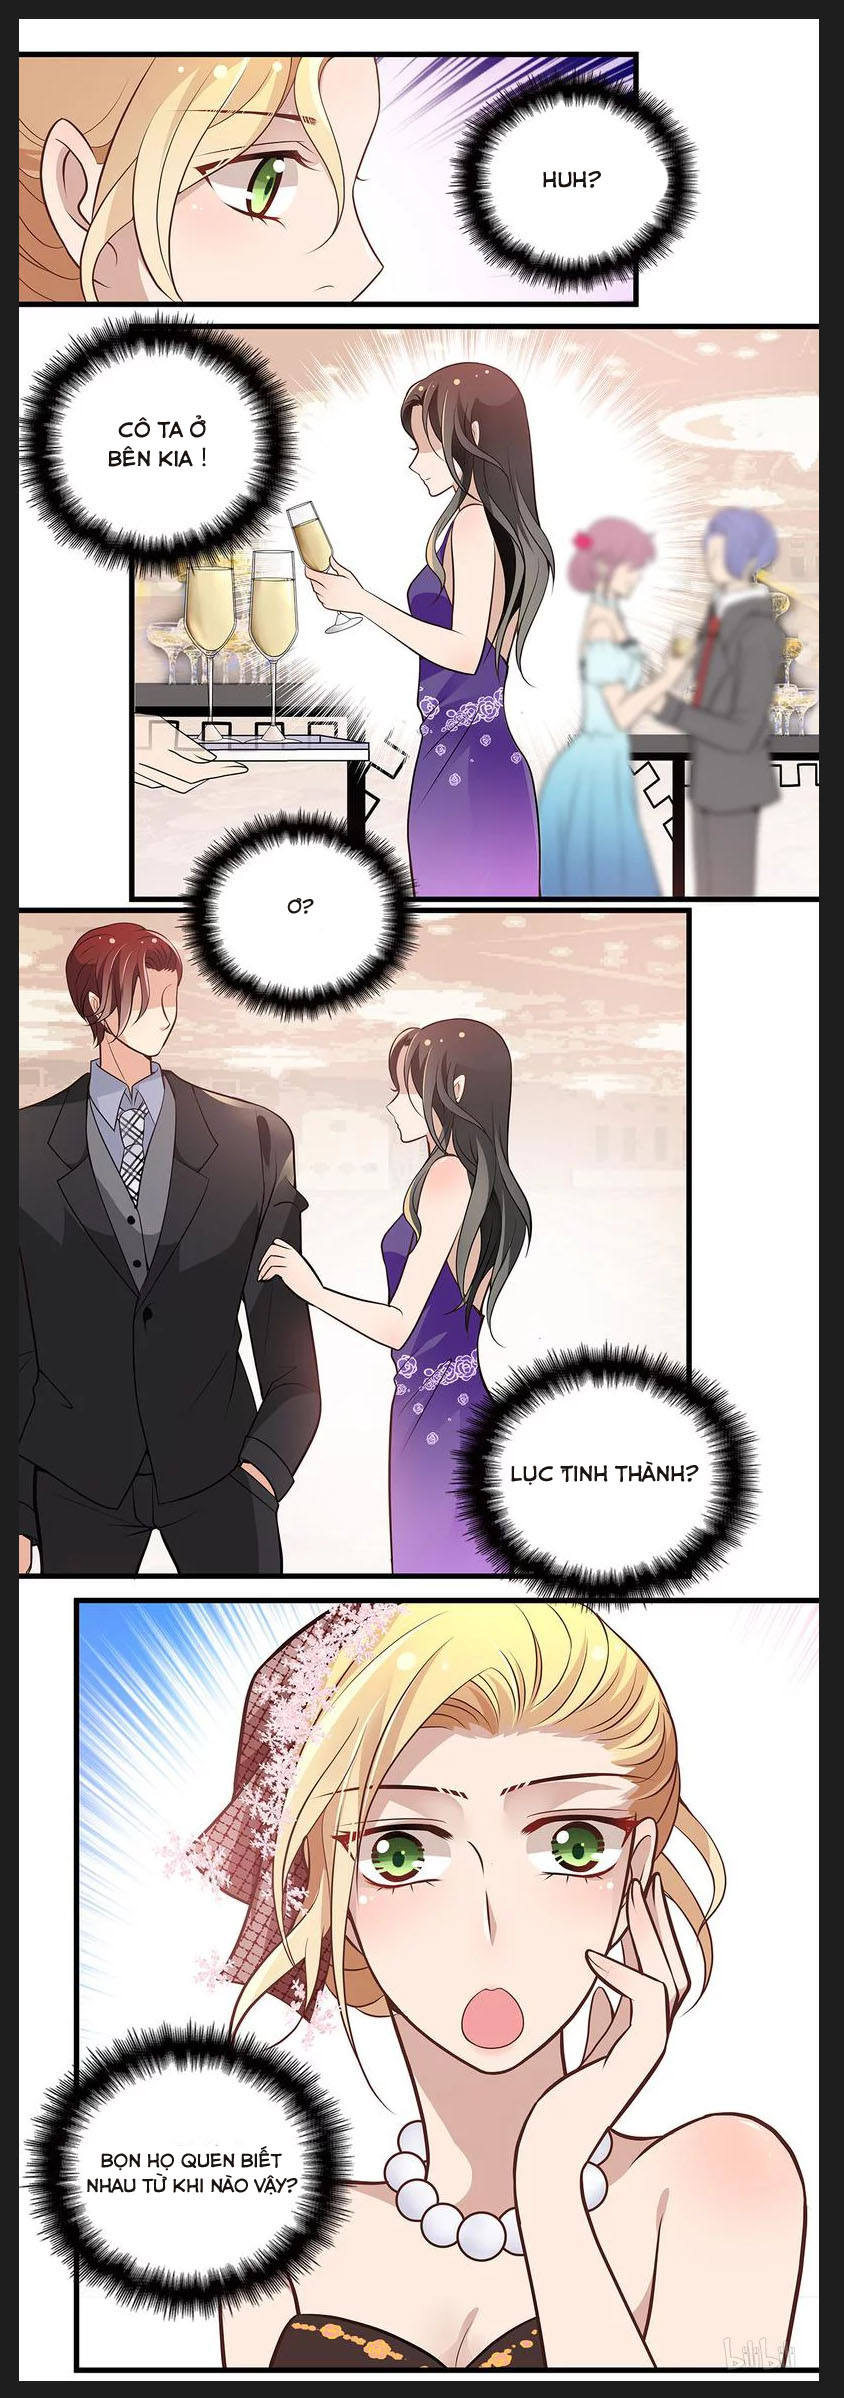 Mai Nữ Đồng Tiểu Nộ Chapter 86 - Truyenmoi.xyz